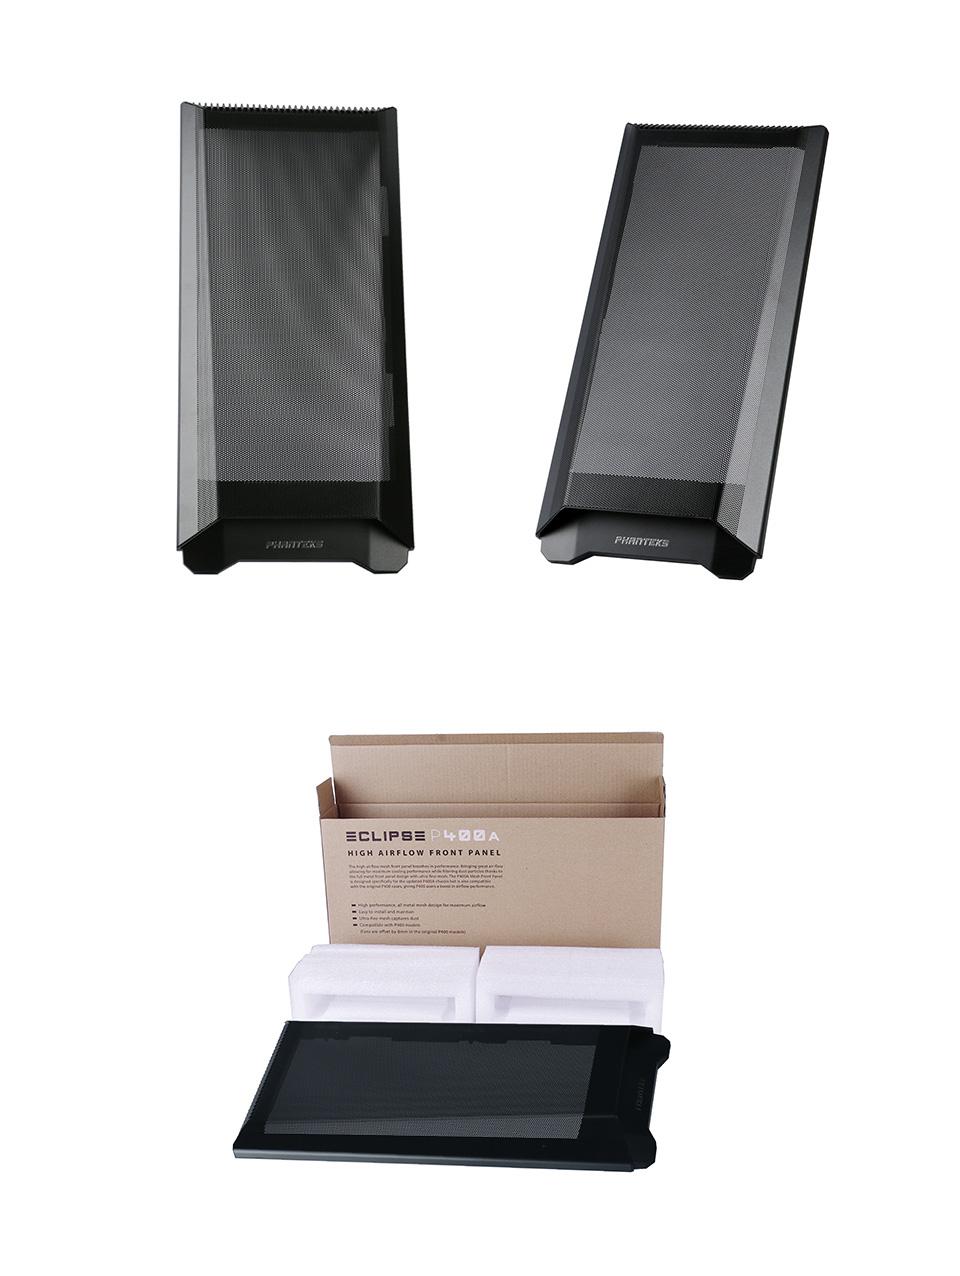 Phanteks Eclipse P400 Air Metal Front Panel Black product